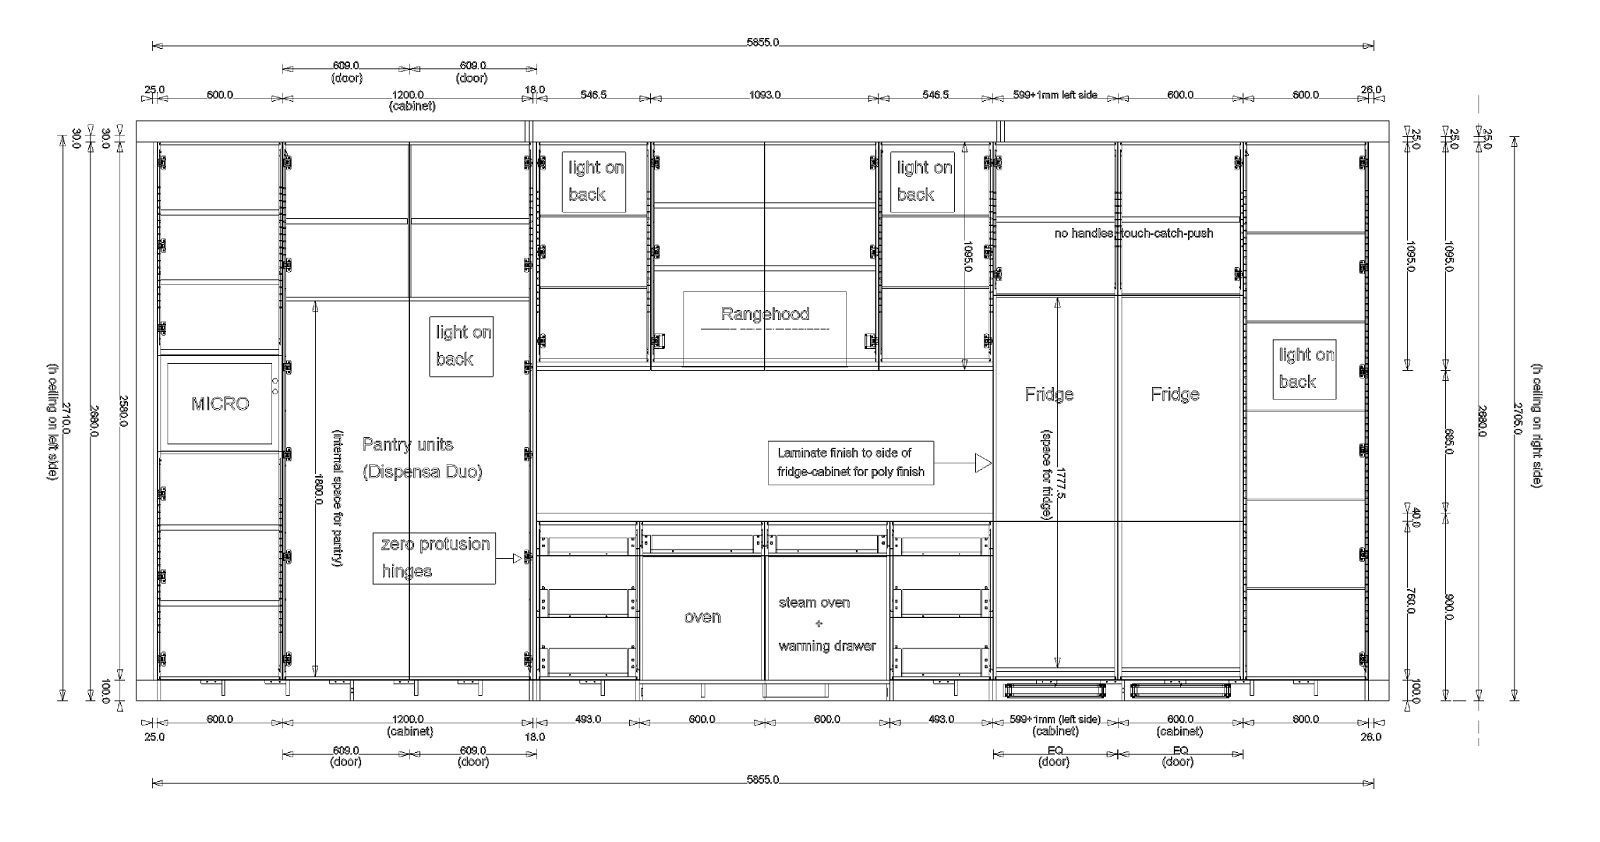 Furniture design software   CAD   for concrete structures SPAZIO3D PROFESSIONAL BRAINSOFTWARE   SPAZIO3D. Furniture design software   CAD   for concrete structures